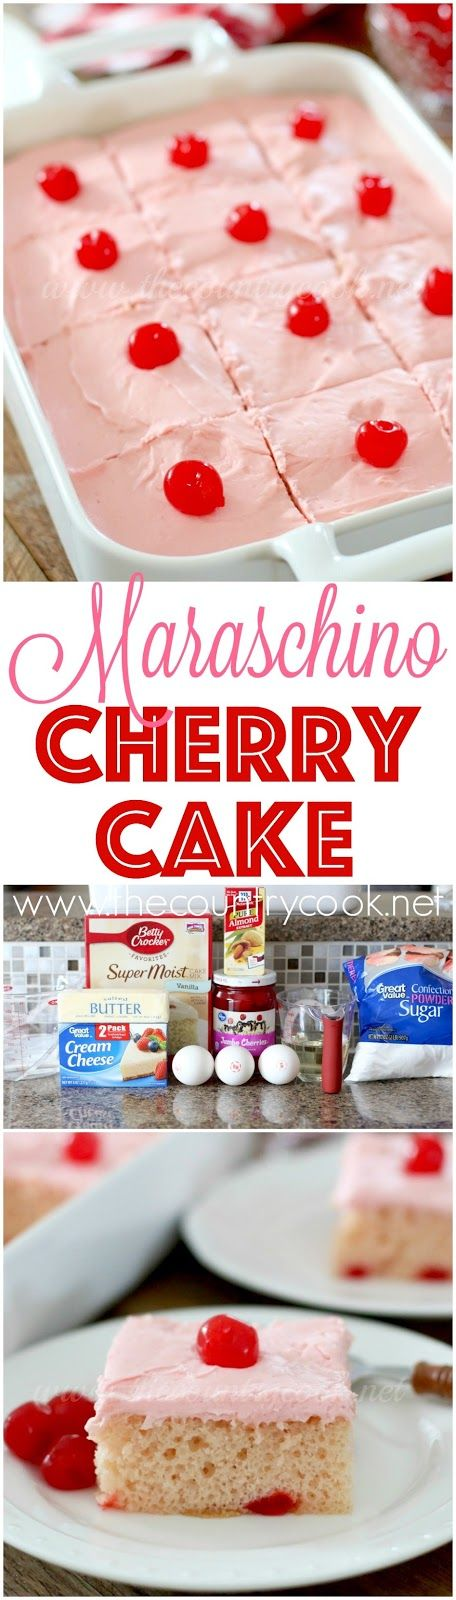 how to make pie filling with maraschino cherries